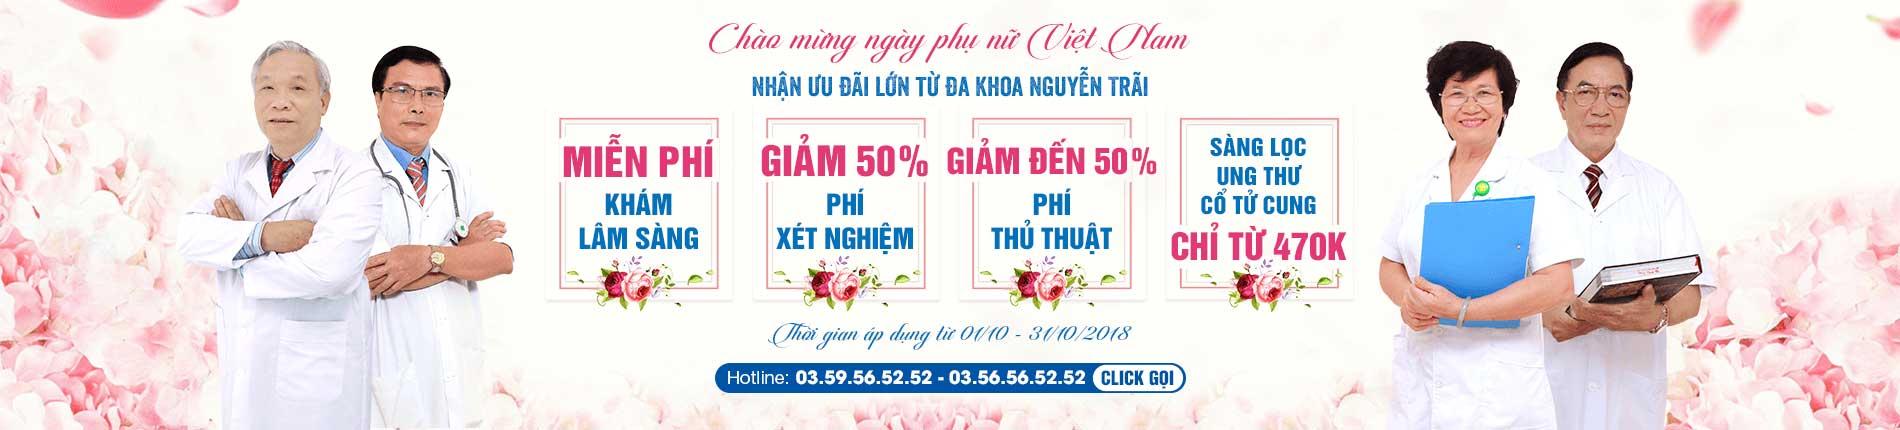 banner-phong-kham-nam-hoc